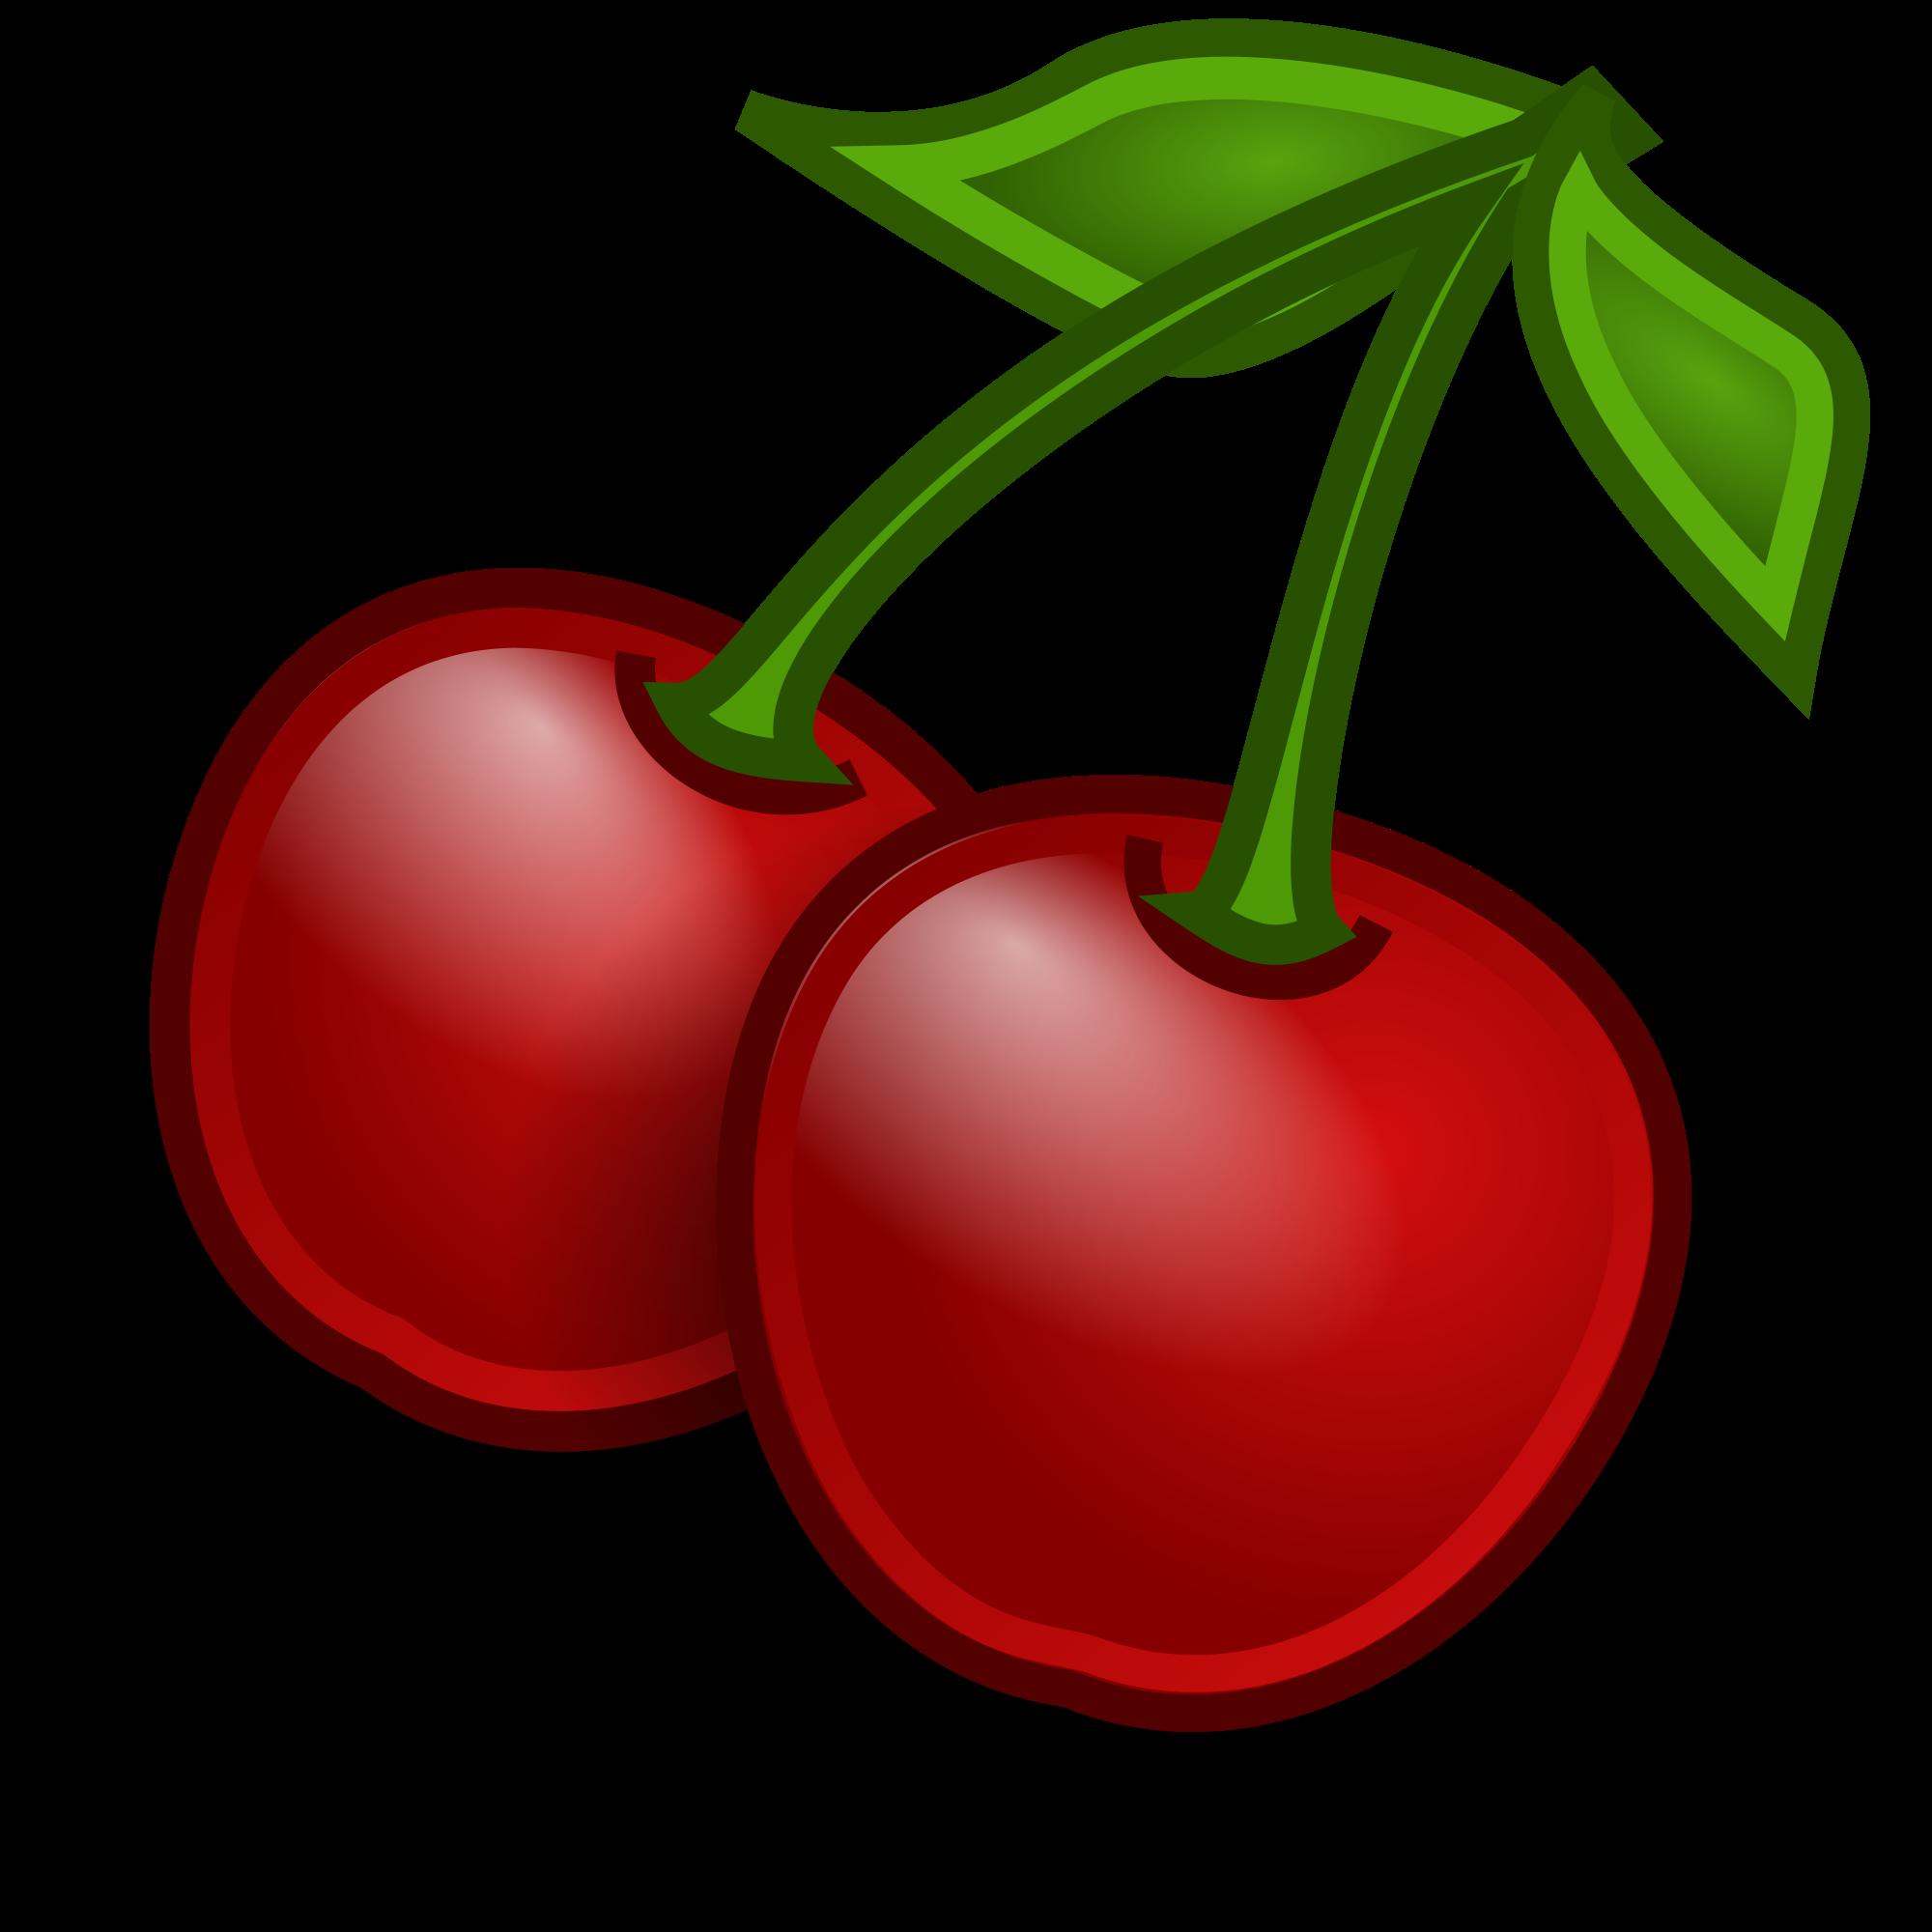 Fruit svg #9, Download drawings